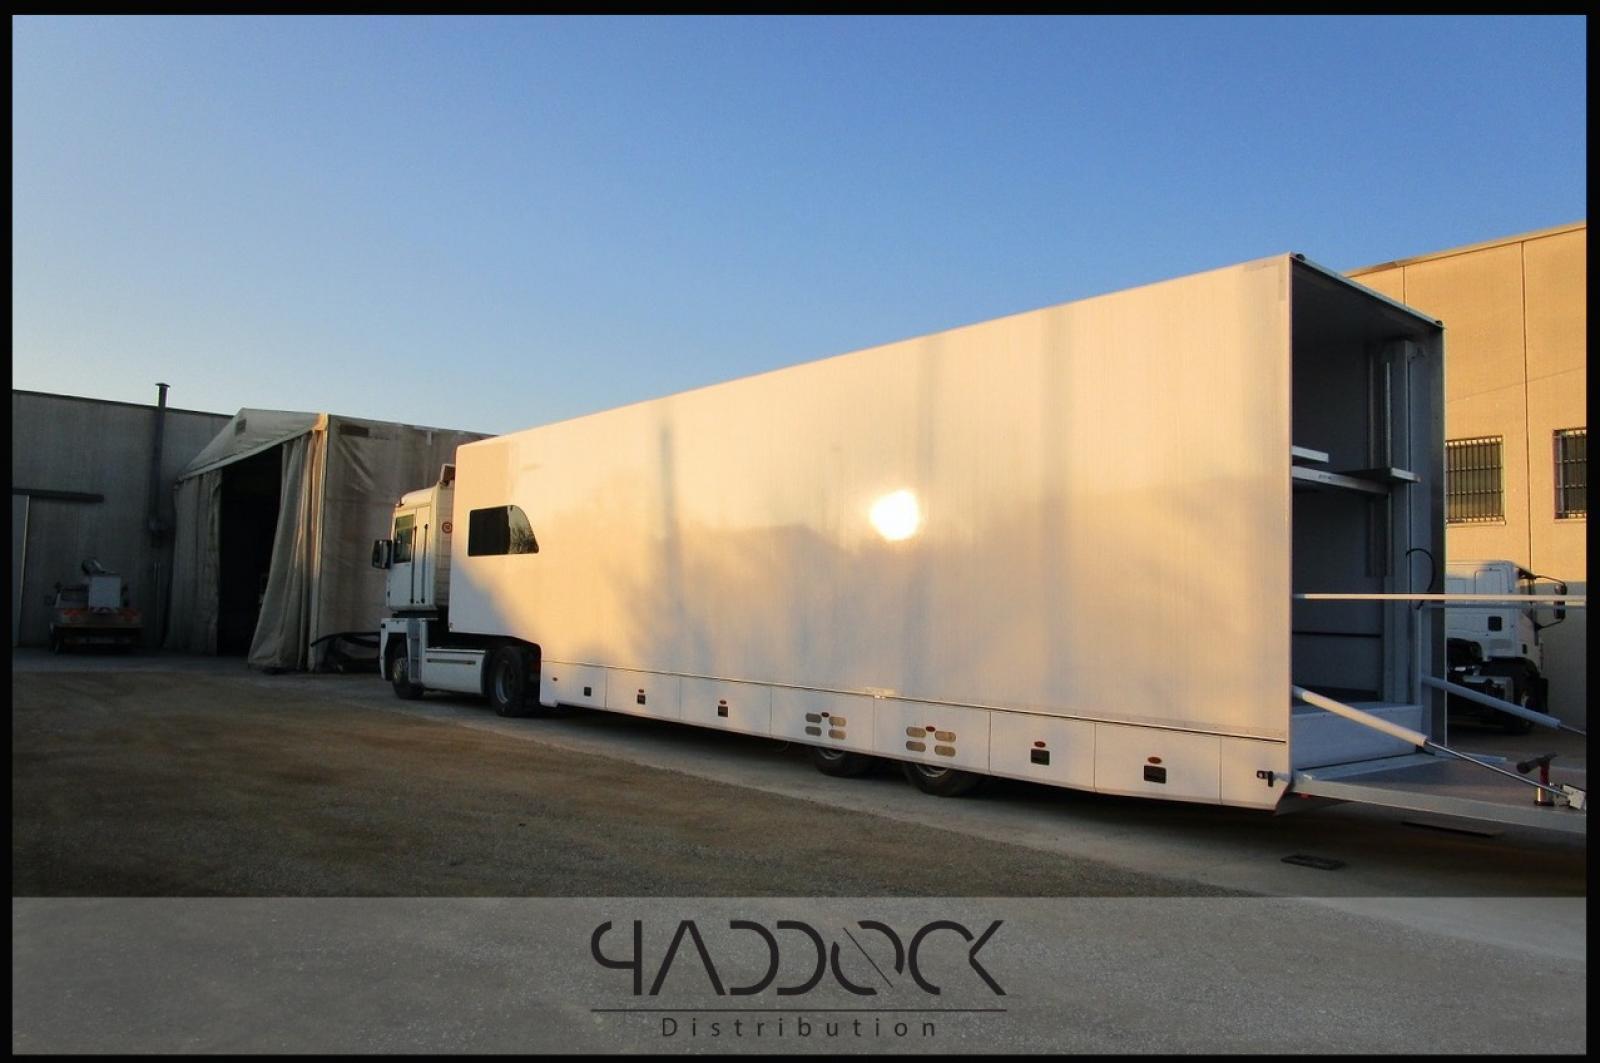 Used trailer ASTA CAR model Z2 by PADDOCK DISTRIBUTION - 2